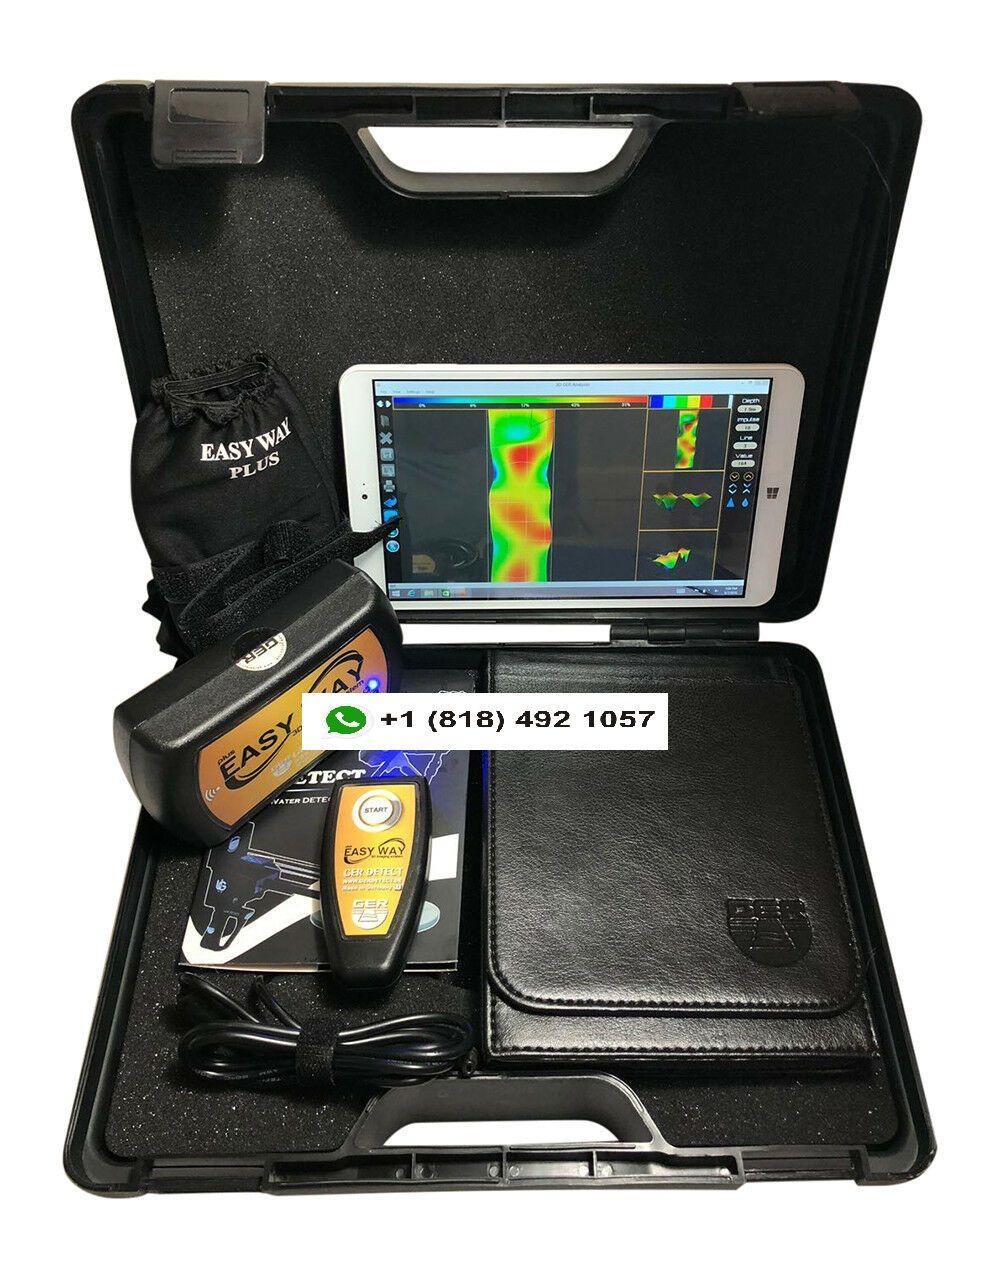 Ger detect easy way plus professional 3d geolocator